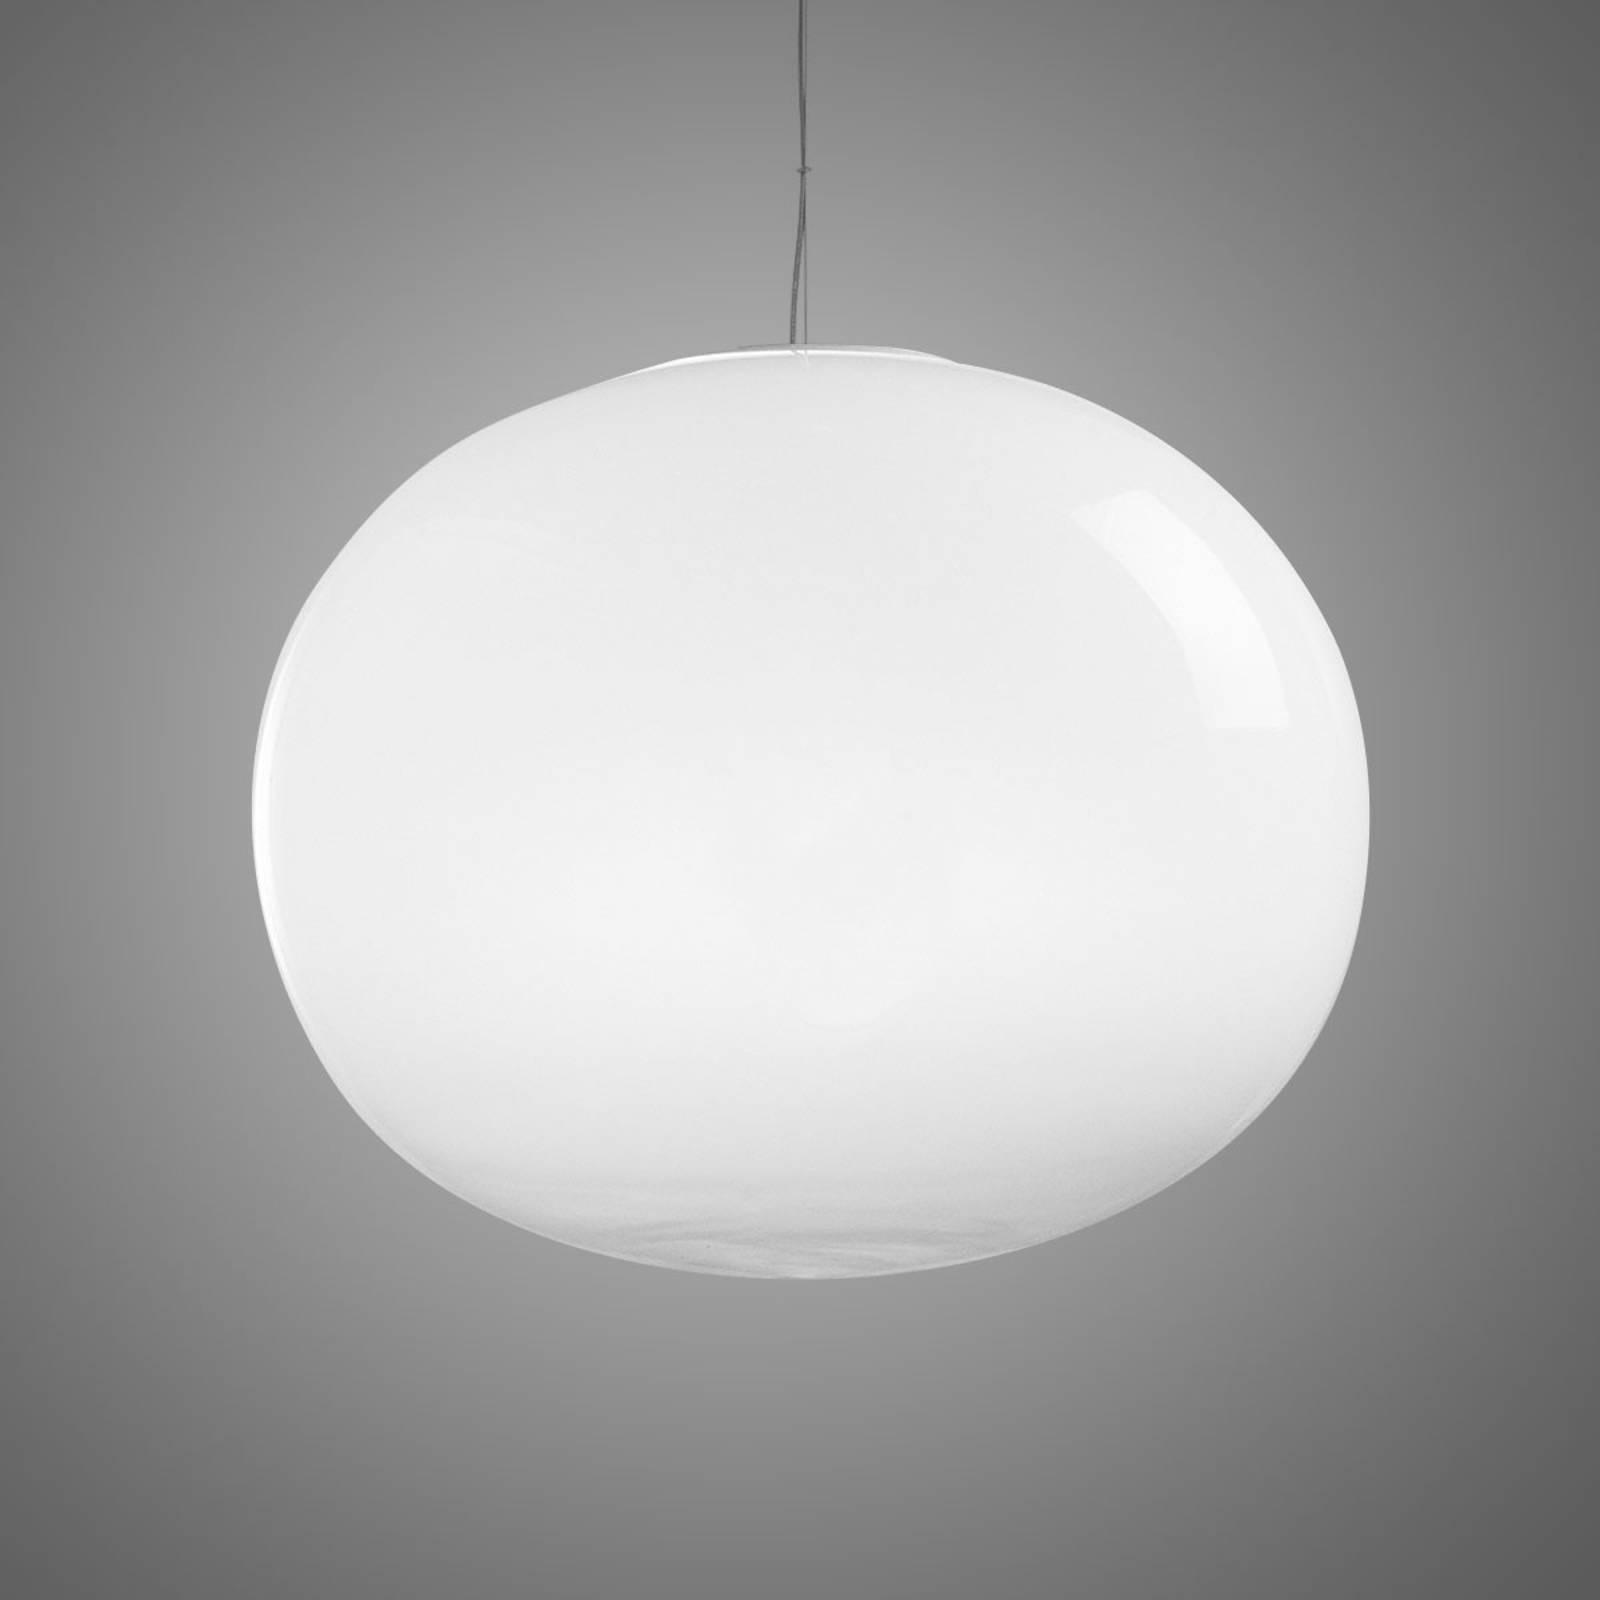 Witte bol-hanglamp Aria 45 cm